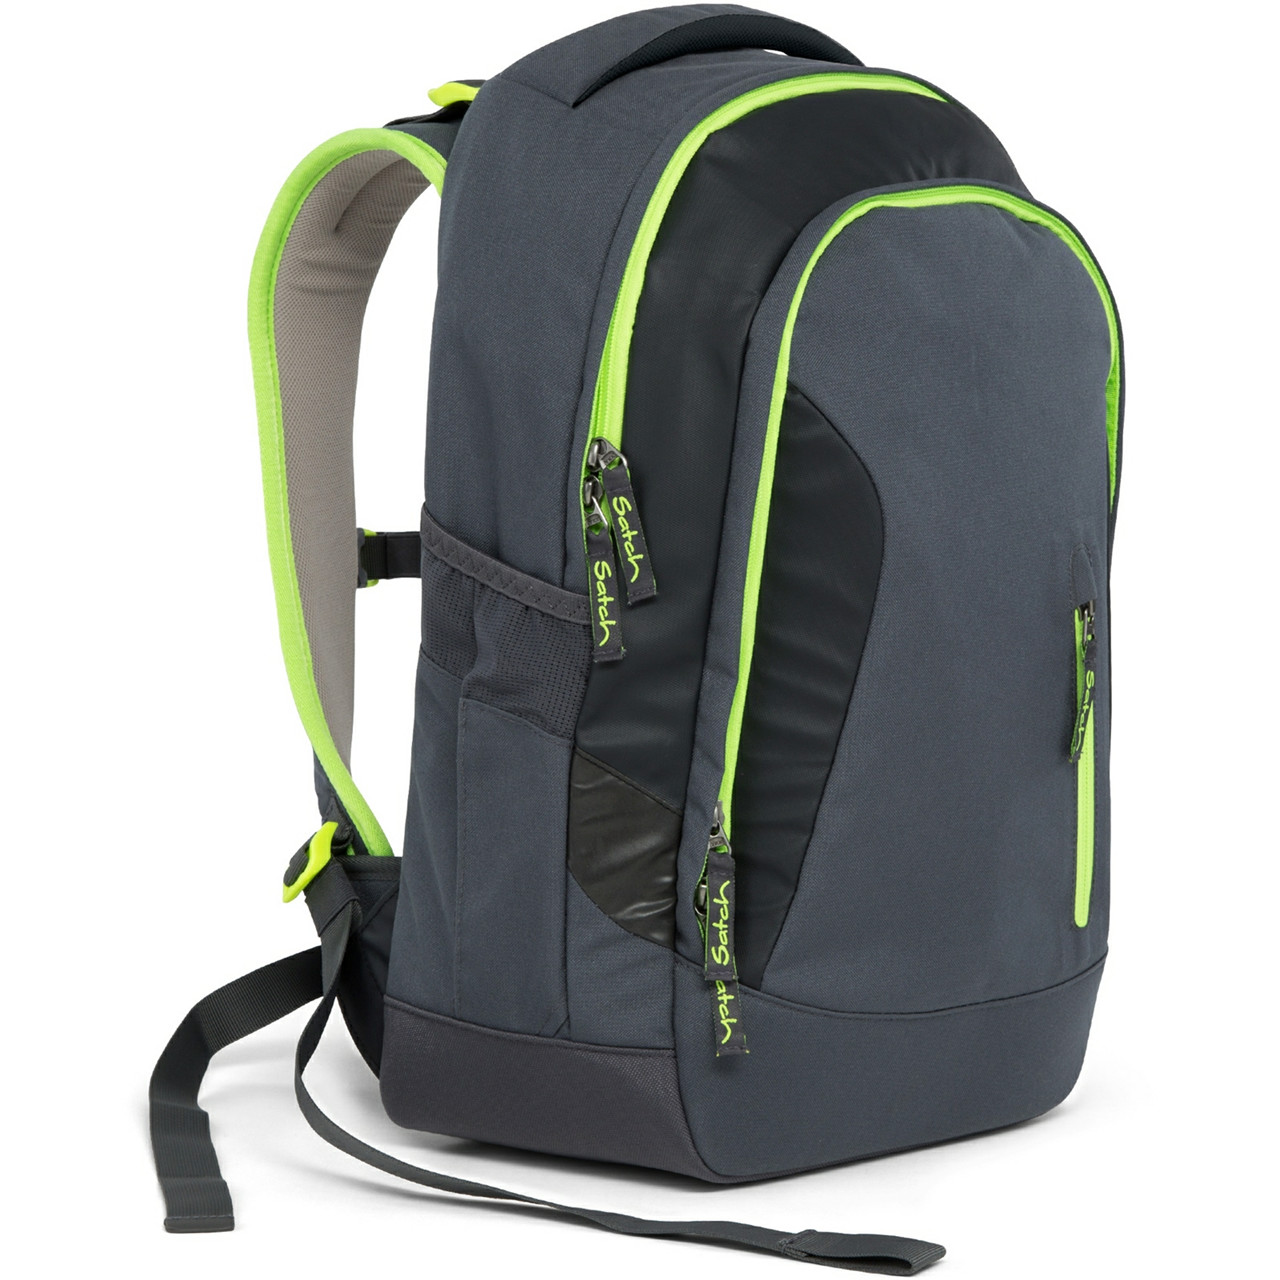 b1fc3b33c3e56 Satch Sleek rygsæk m regulerbar ryg - Køb online her